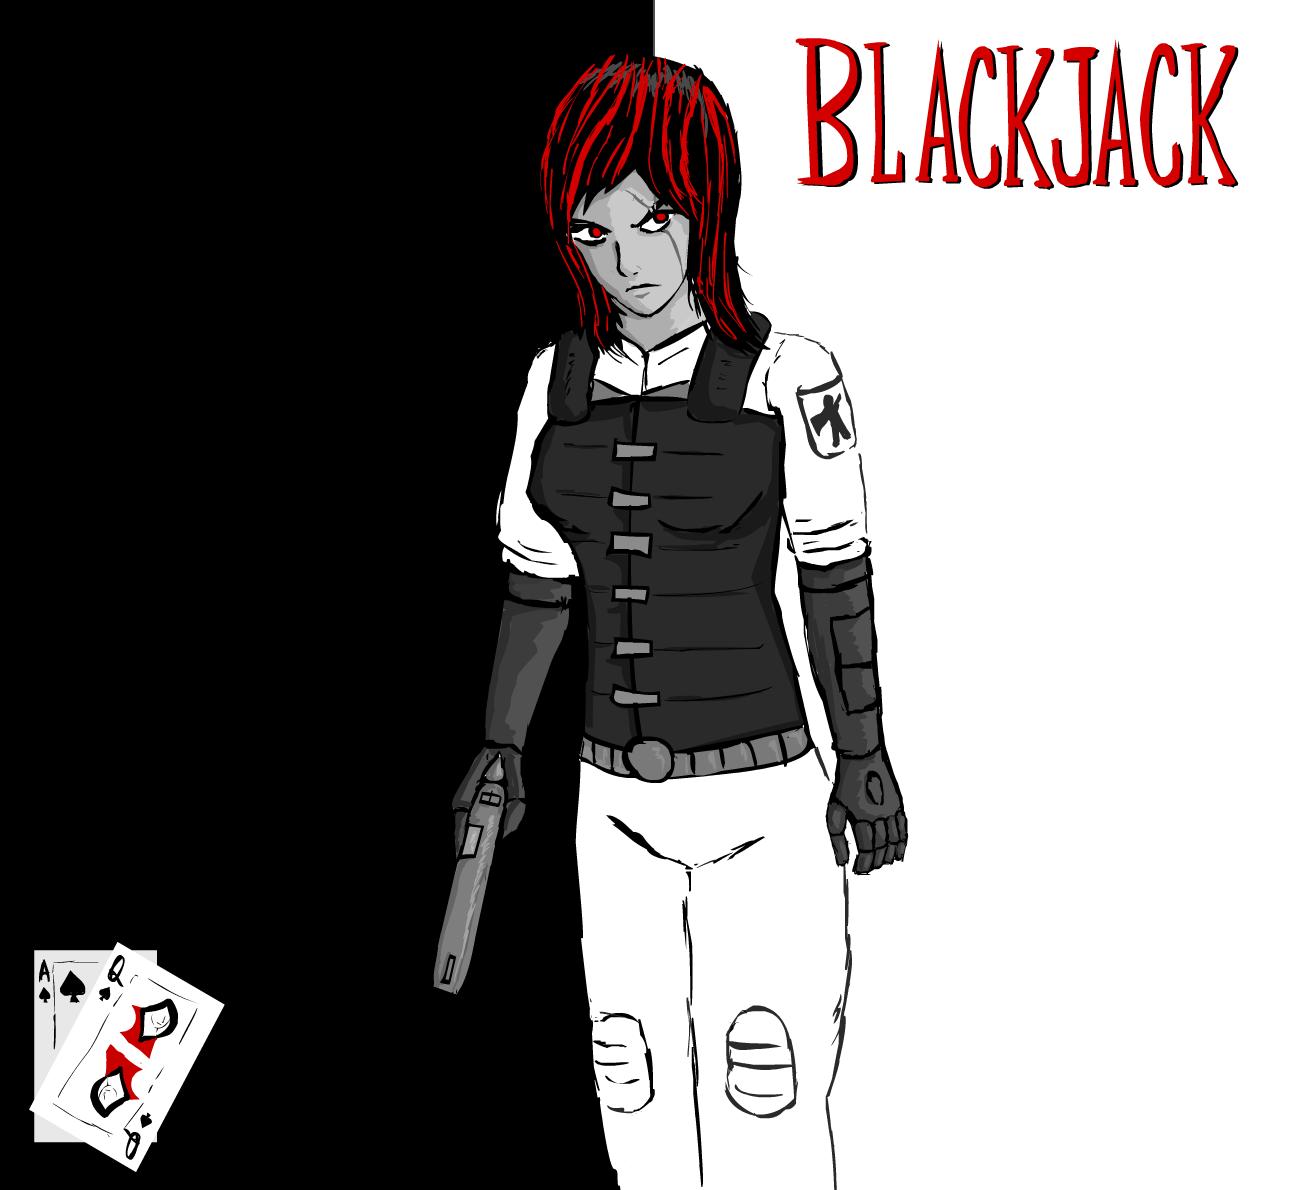 Blackjack penny